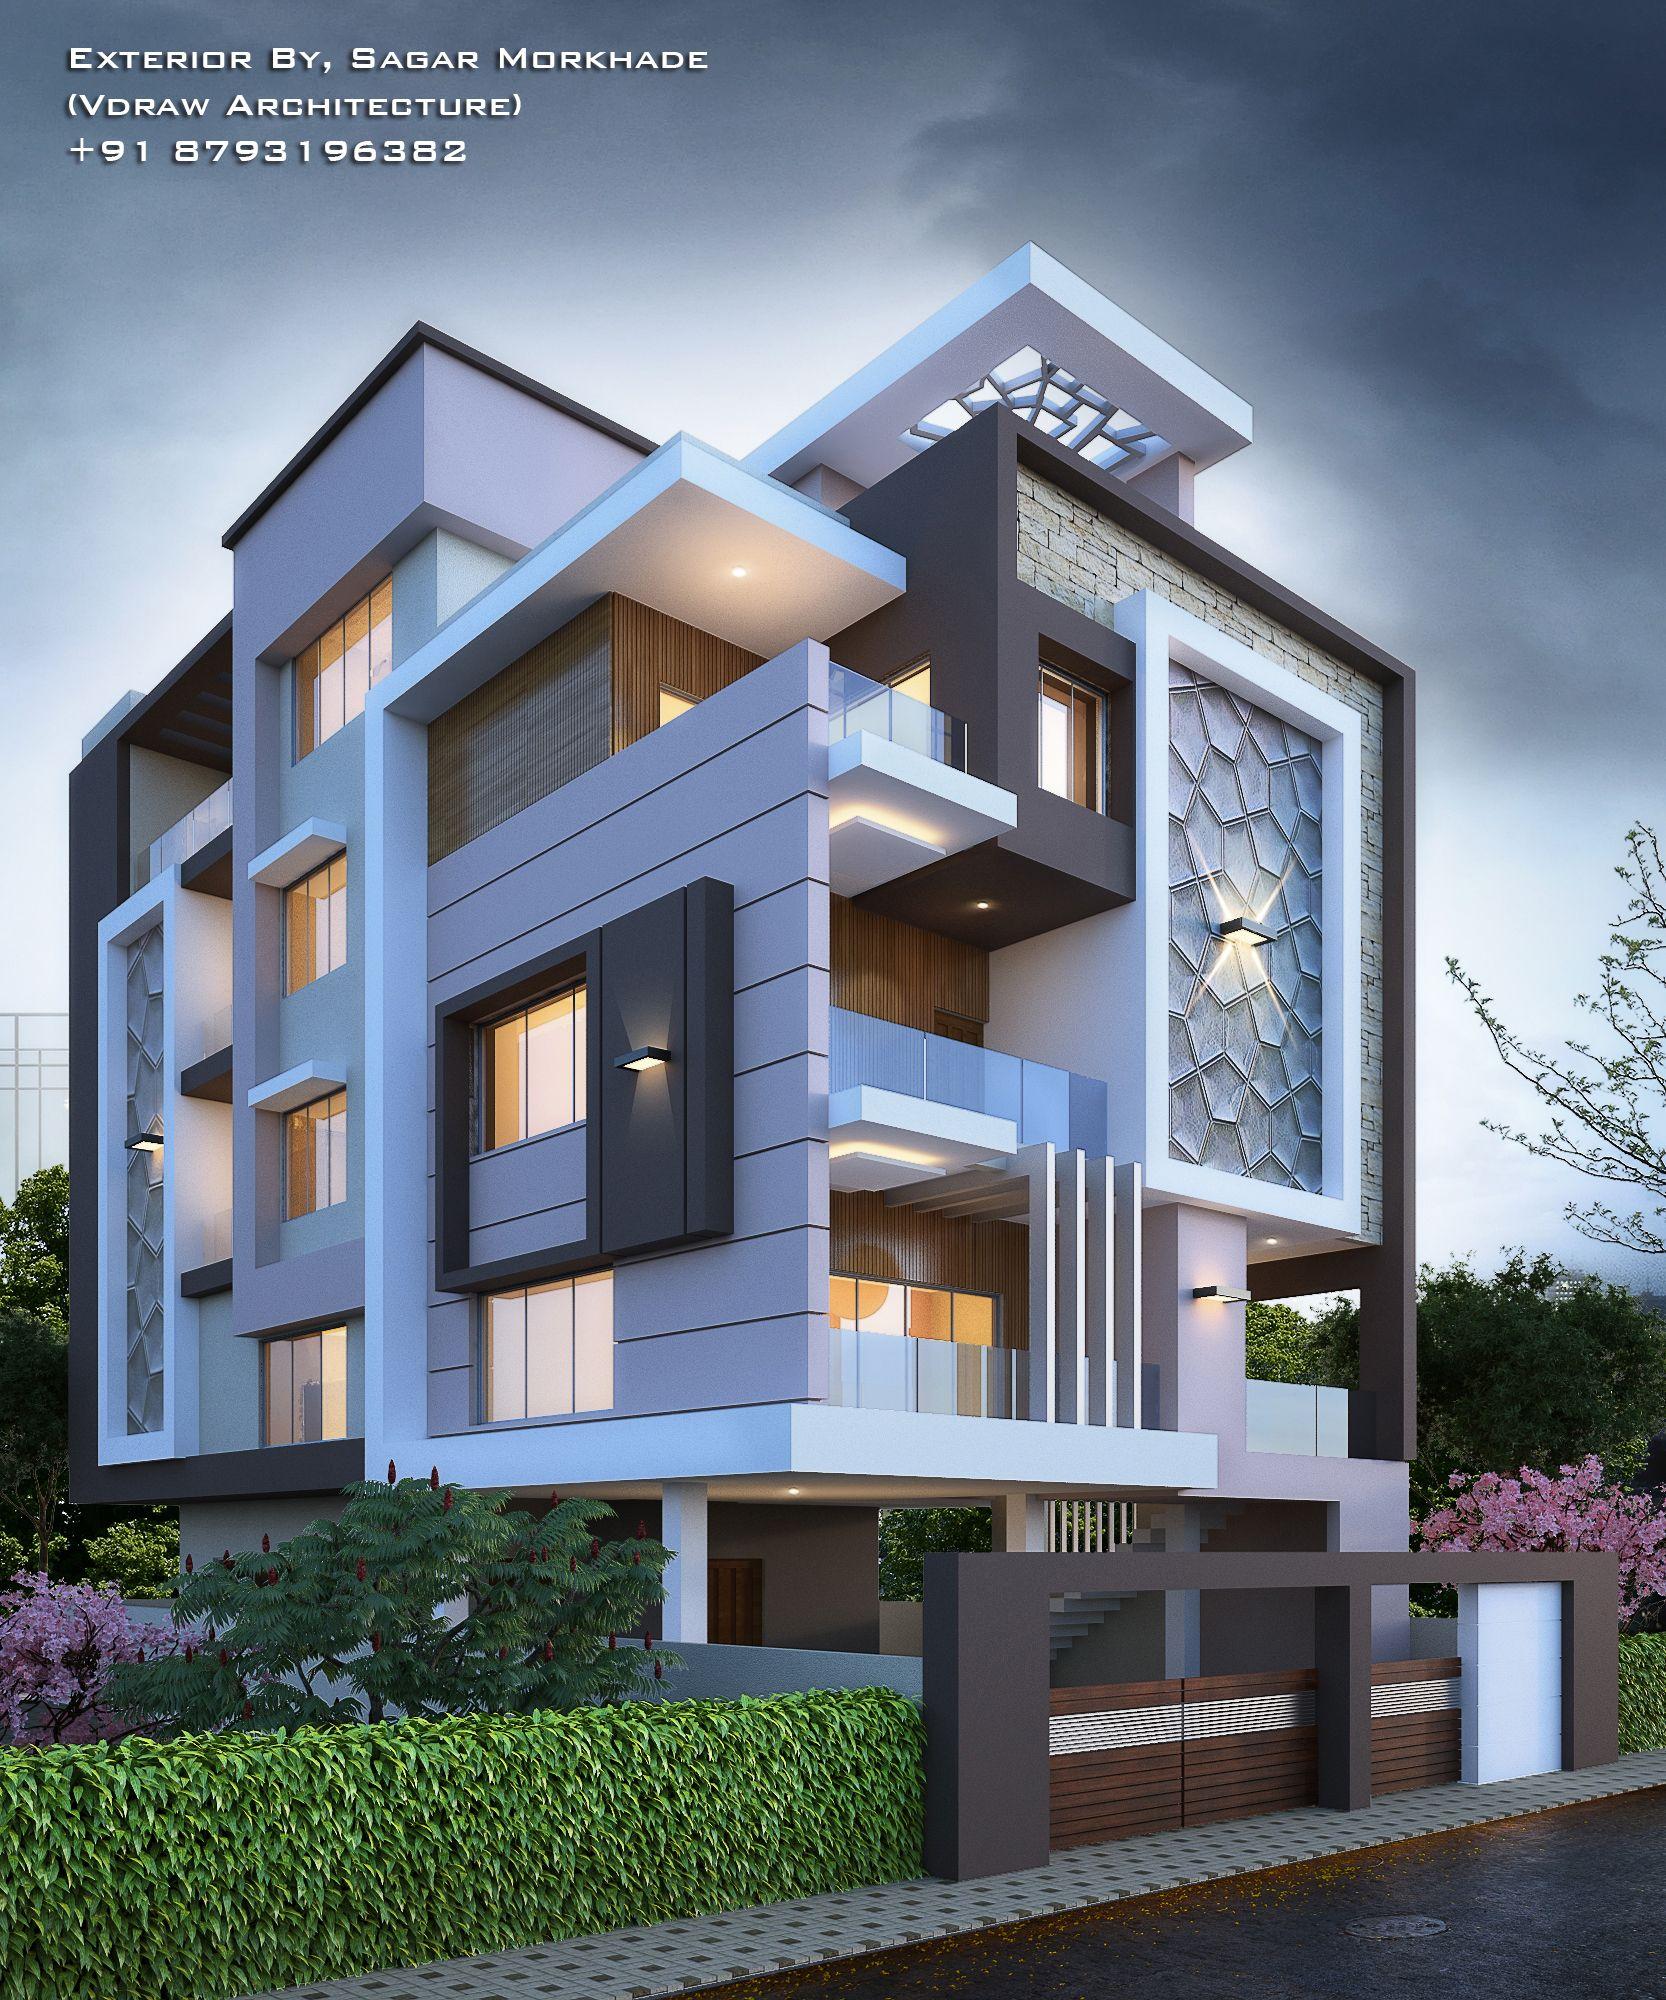 #modern #residential #house #bungalow #exterior Sagar